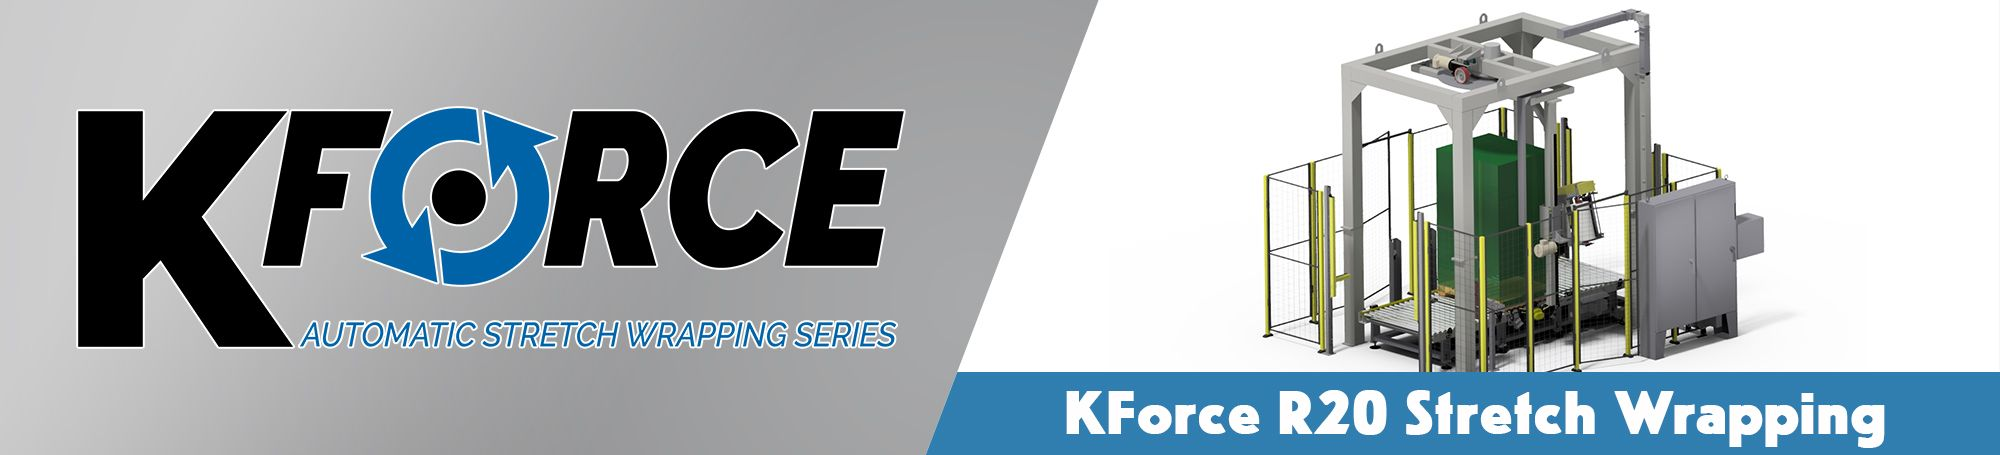 Kforce R20 Wrapper.jpg.